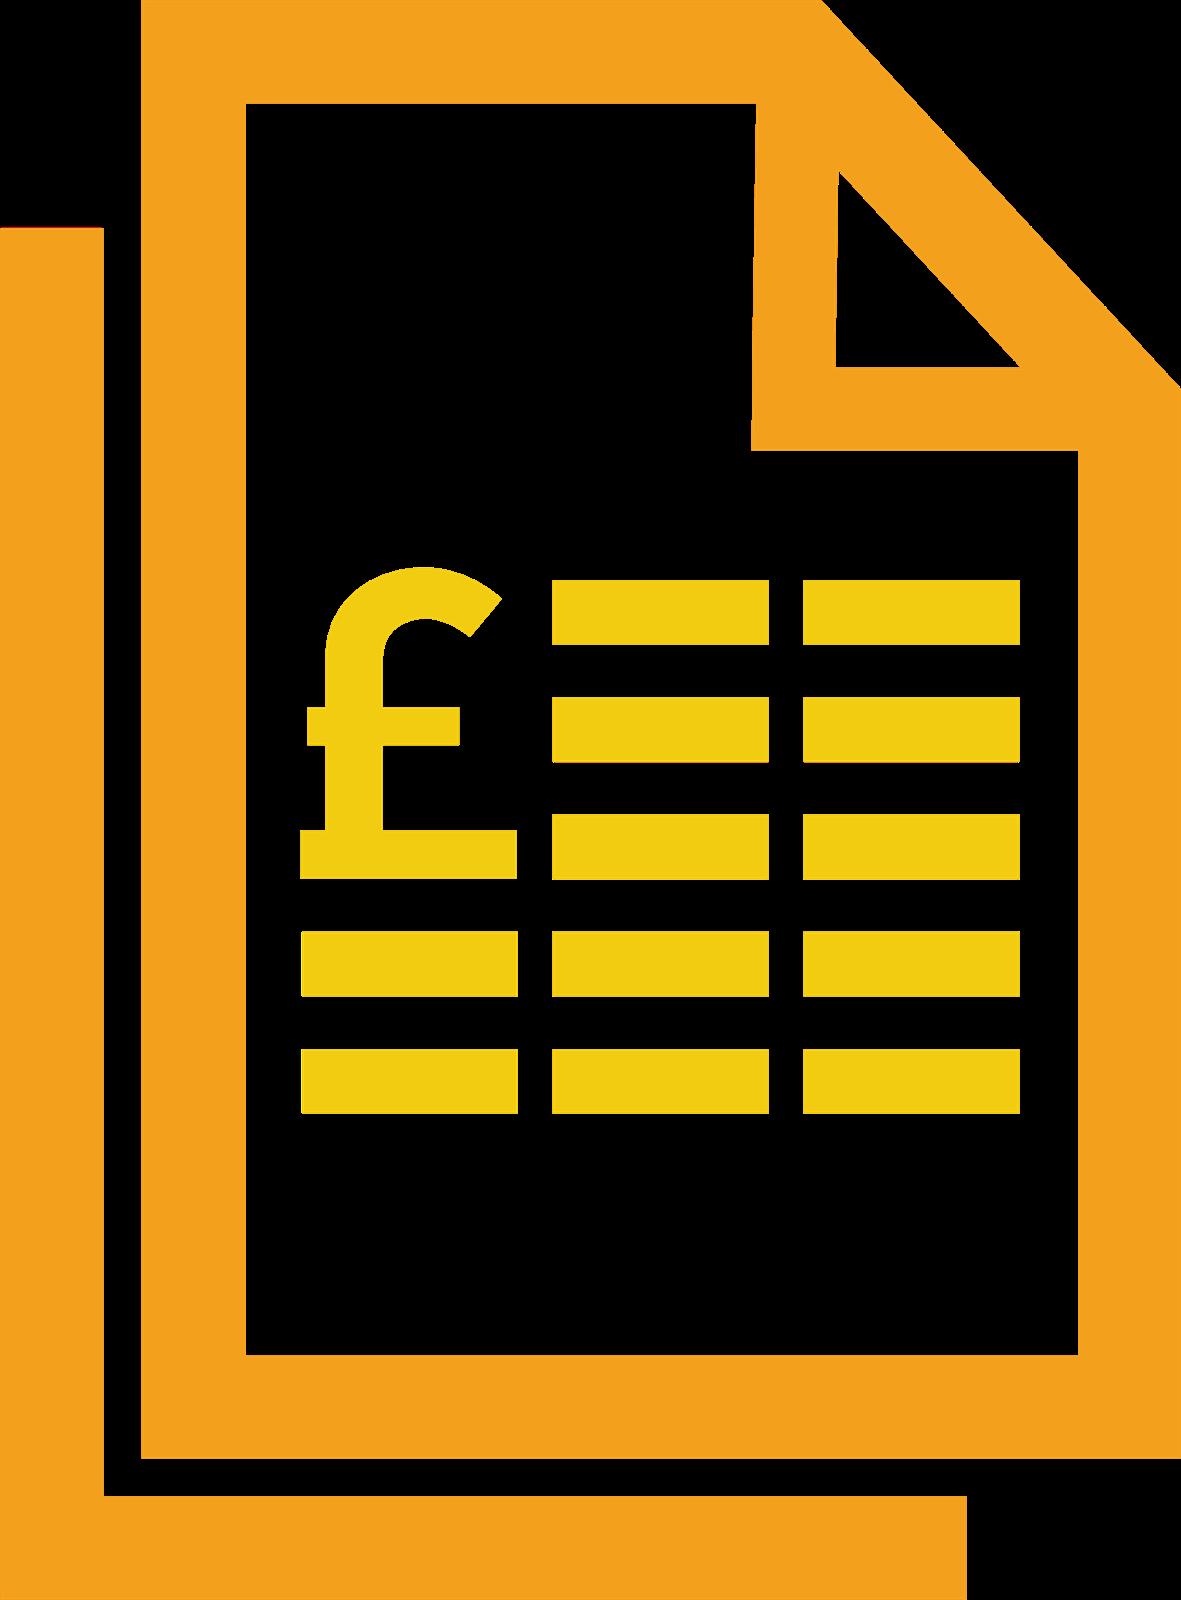 Auto Enrolment Pension Files